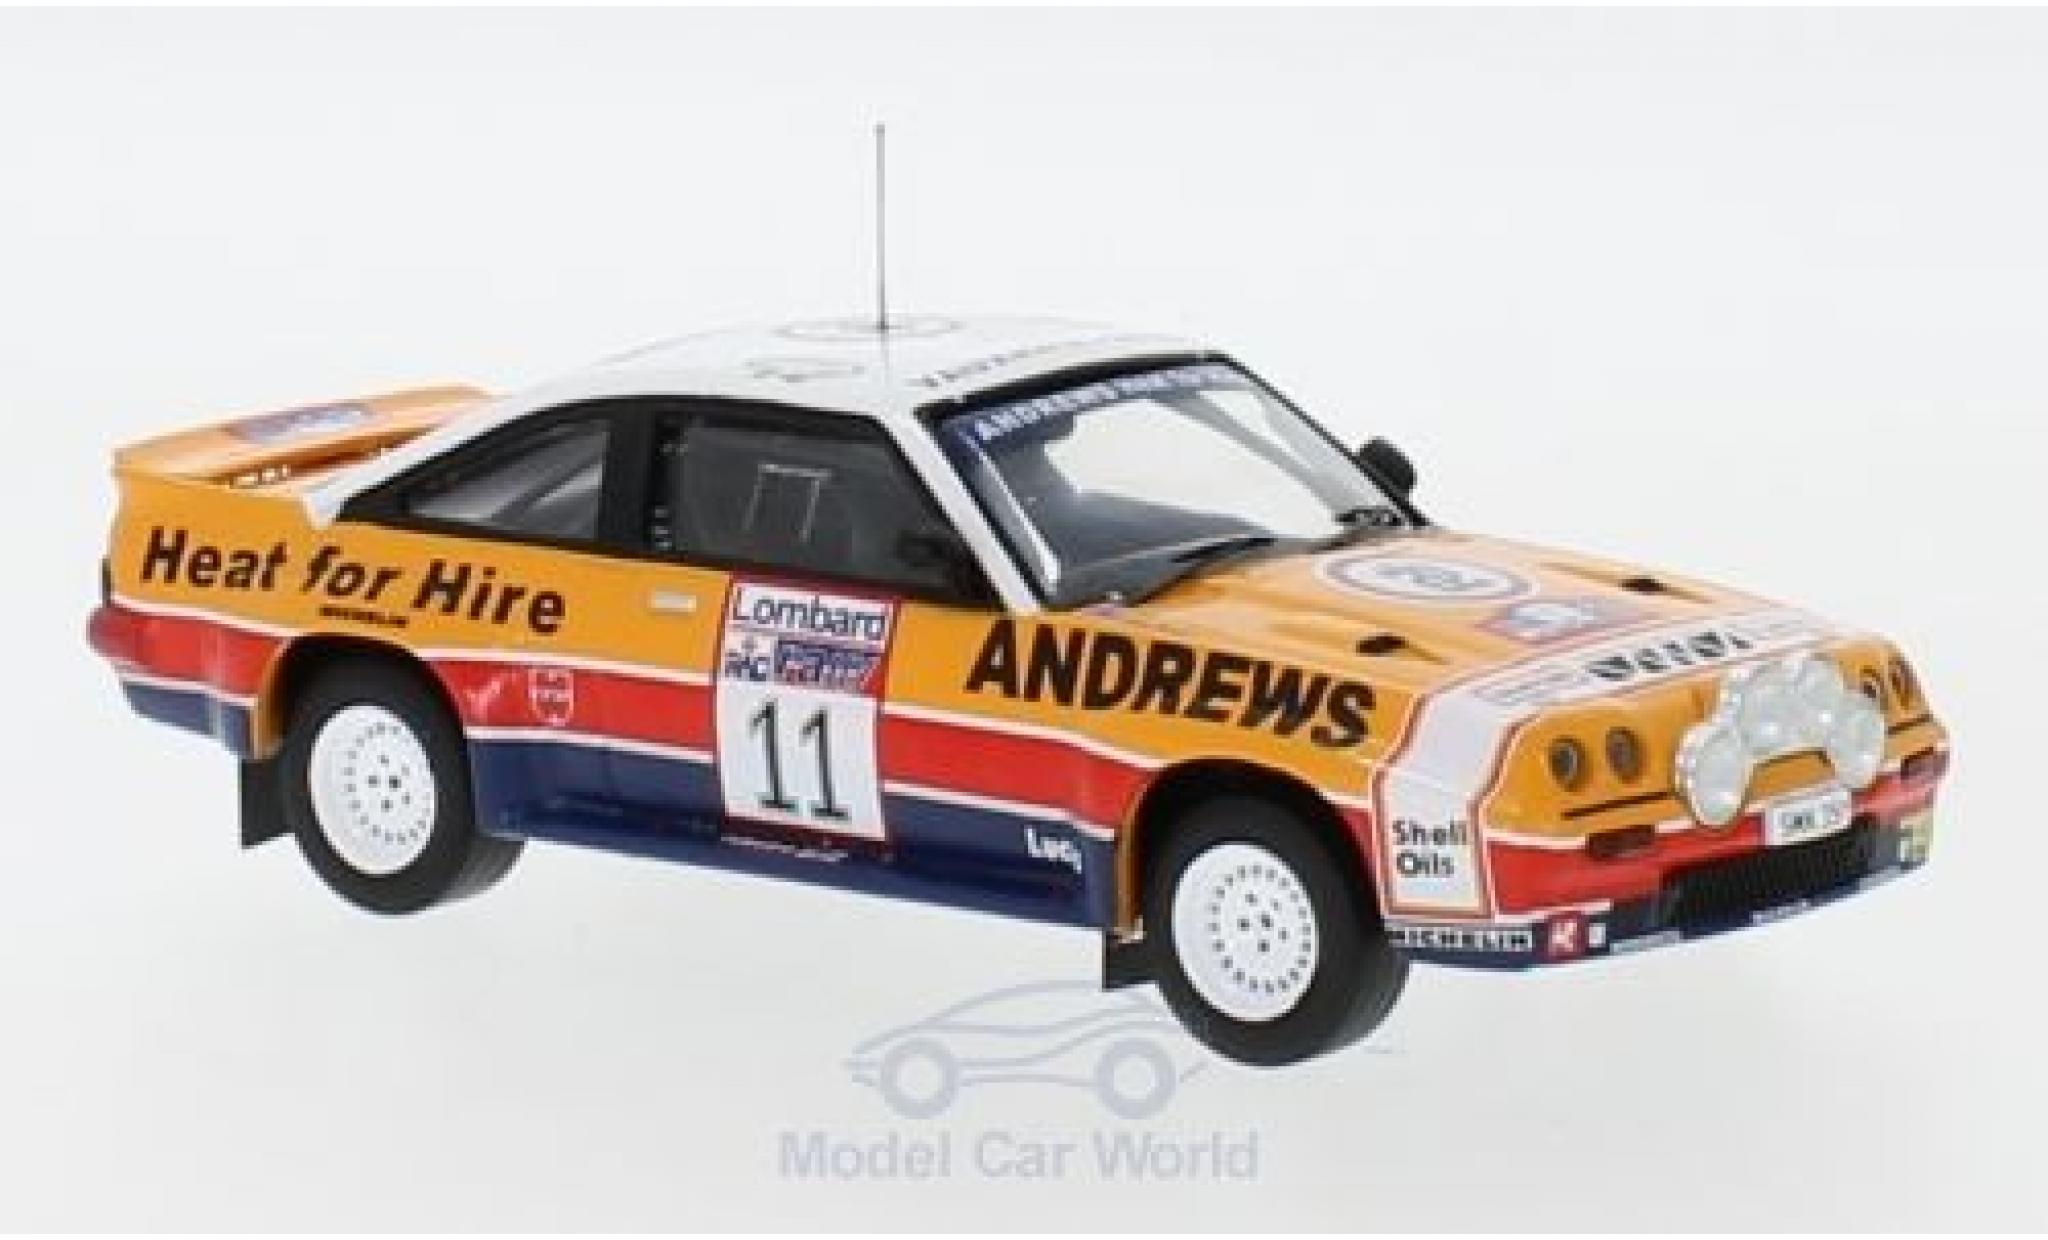 Opel Manta 1/43 IXO 400 RHD No.11 Rallye WM RAC Rallye 1985 R.Brookes/M.Broad